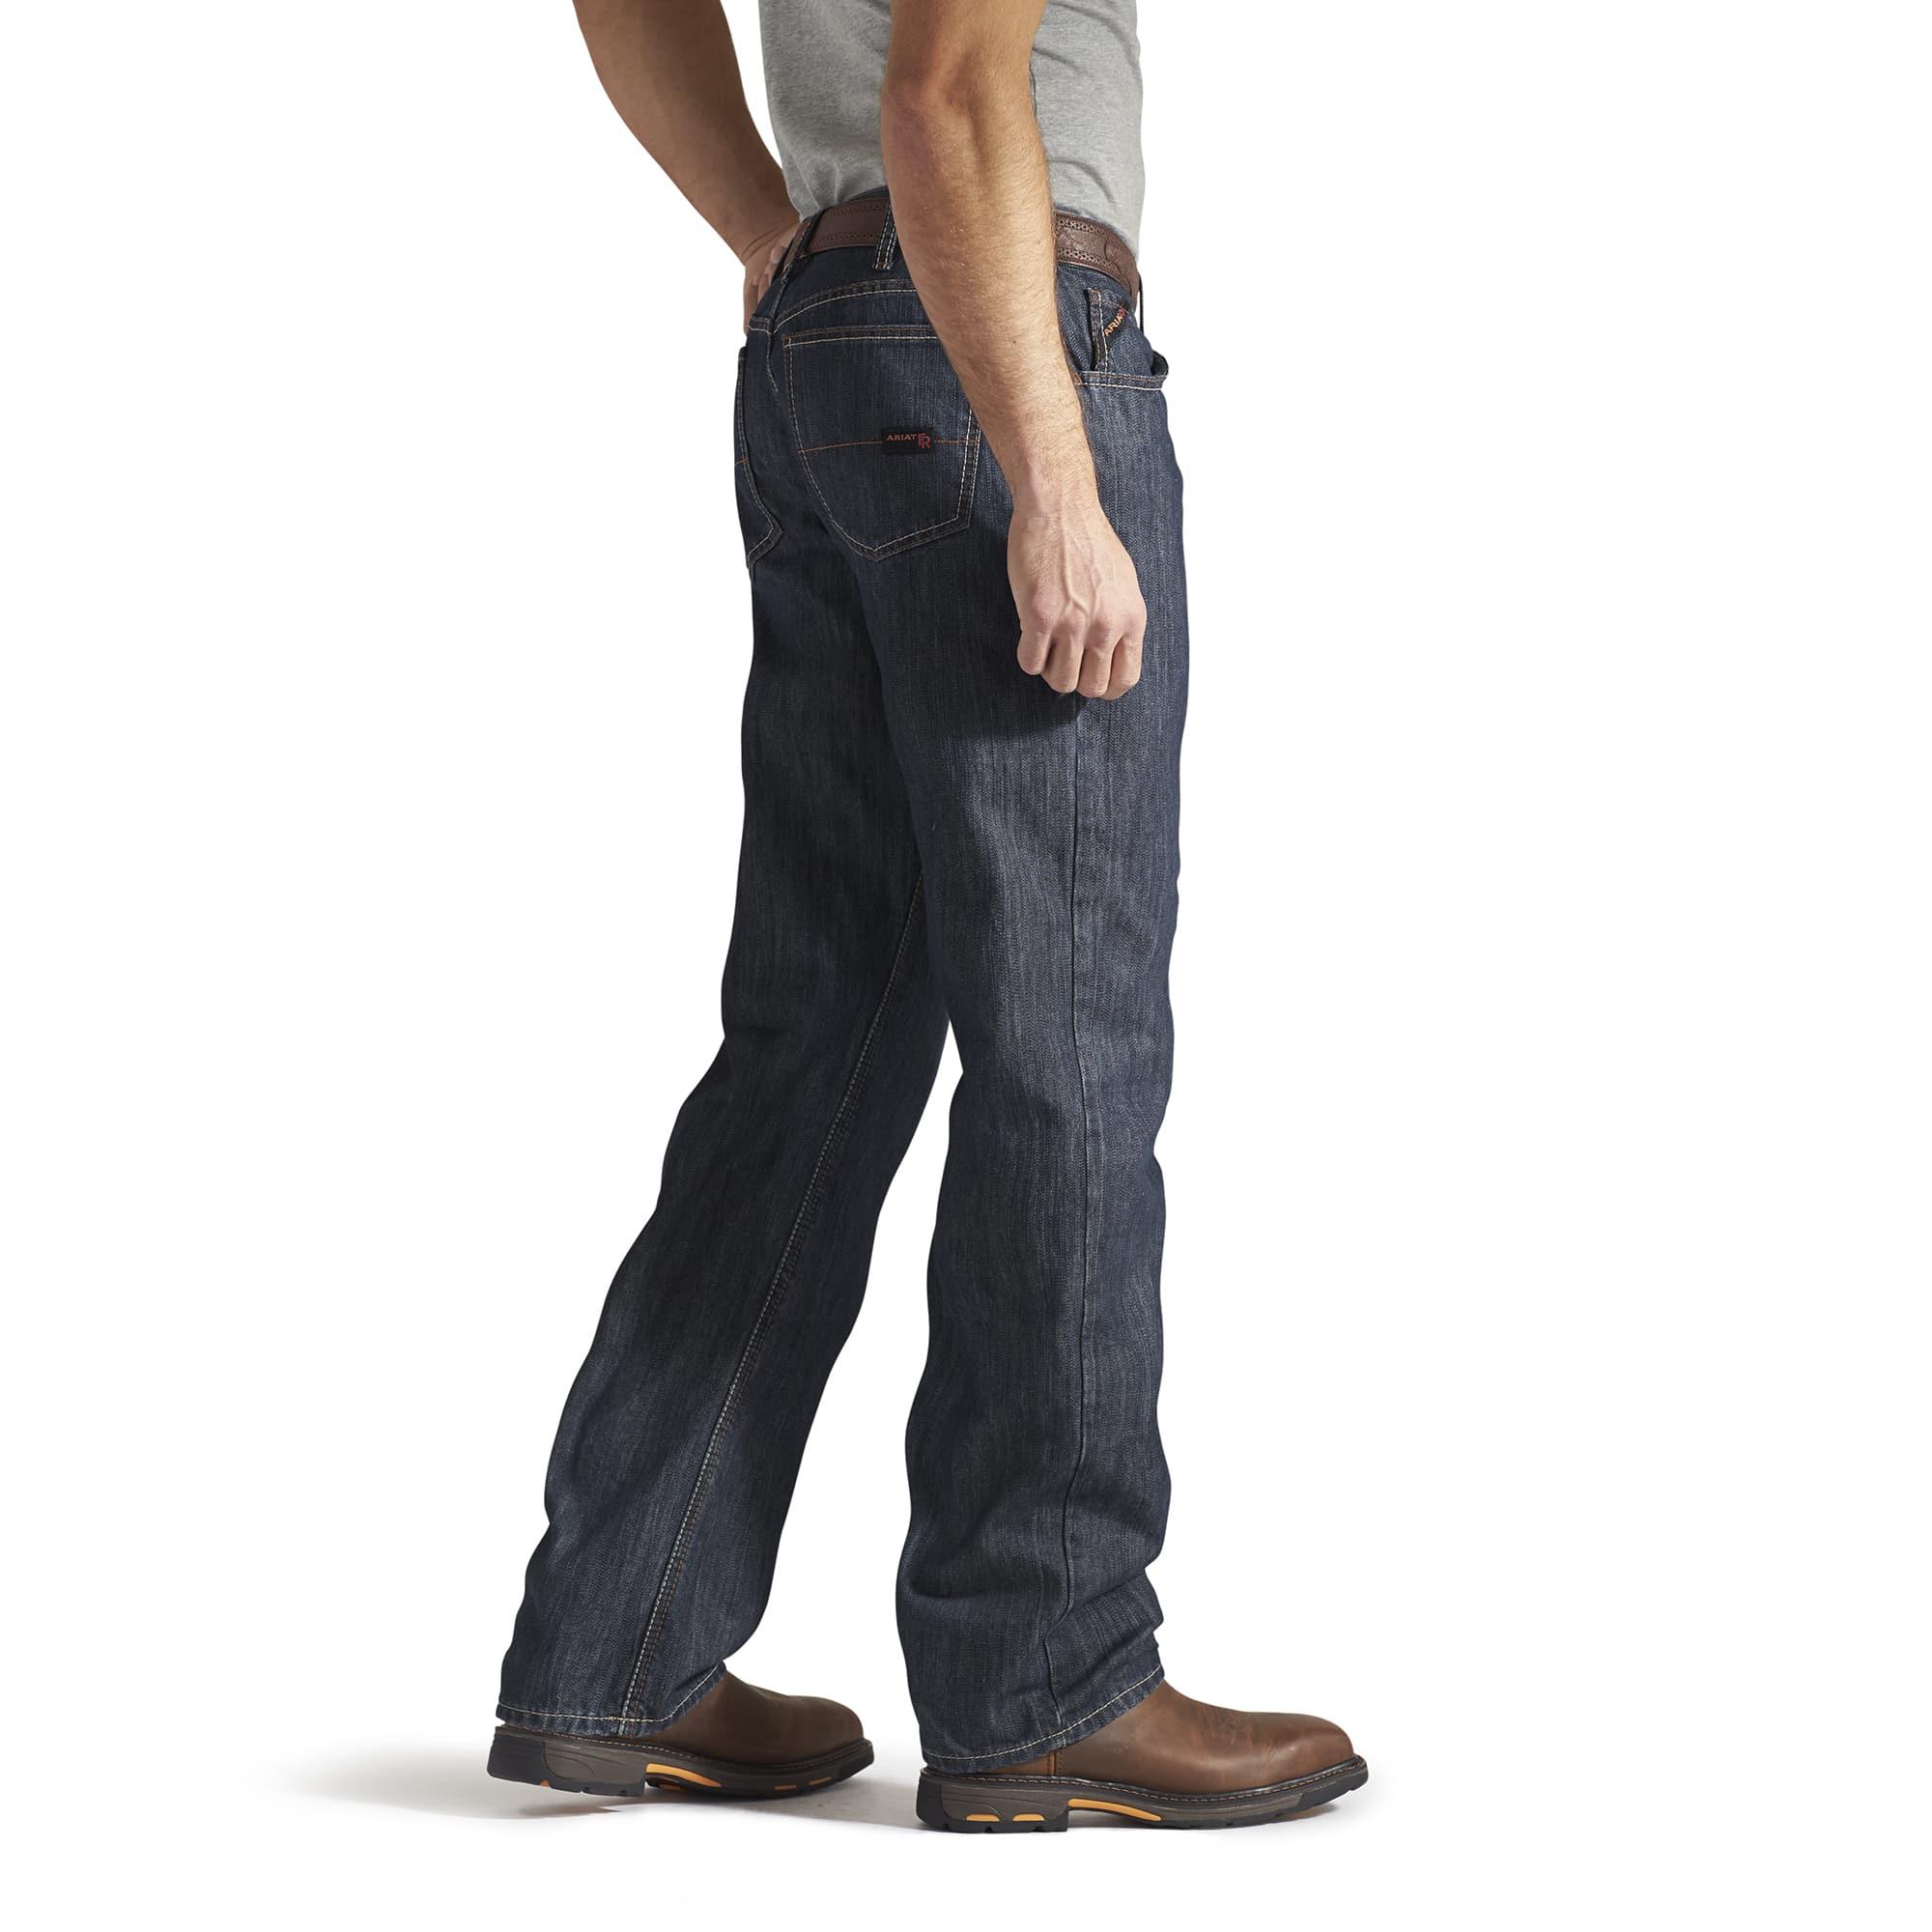 da499492 Ariat Fr Jeans M3 Loose Fit Straight Leg Froutlet